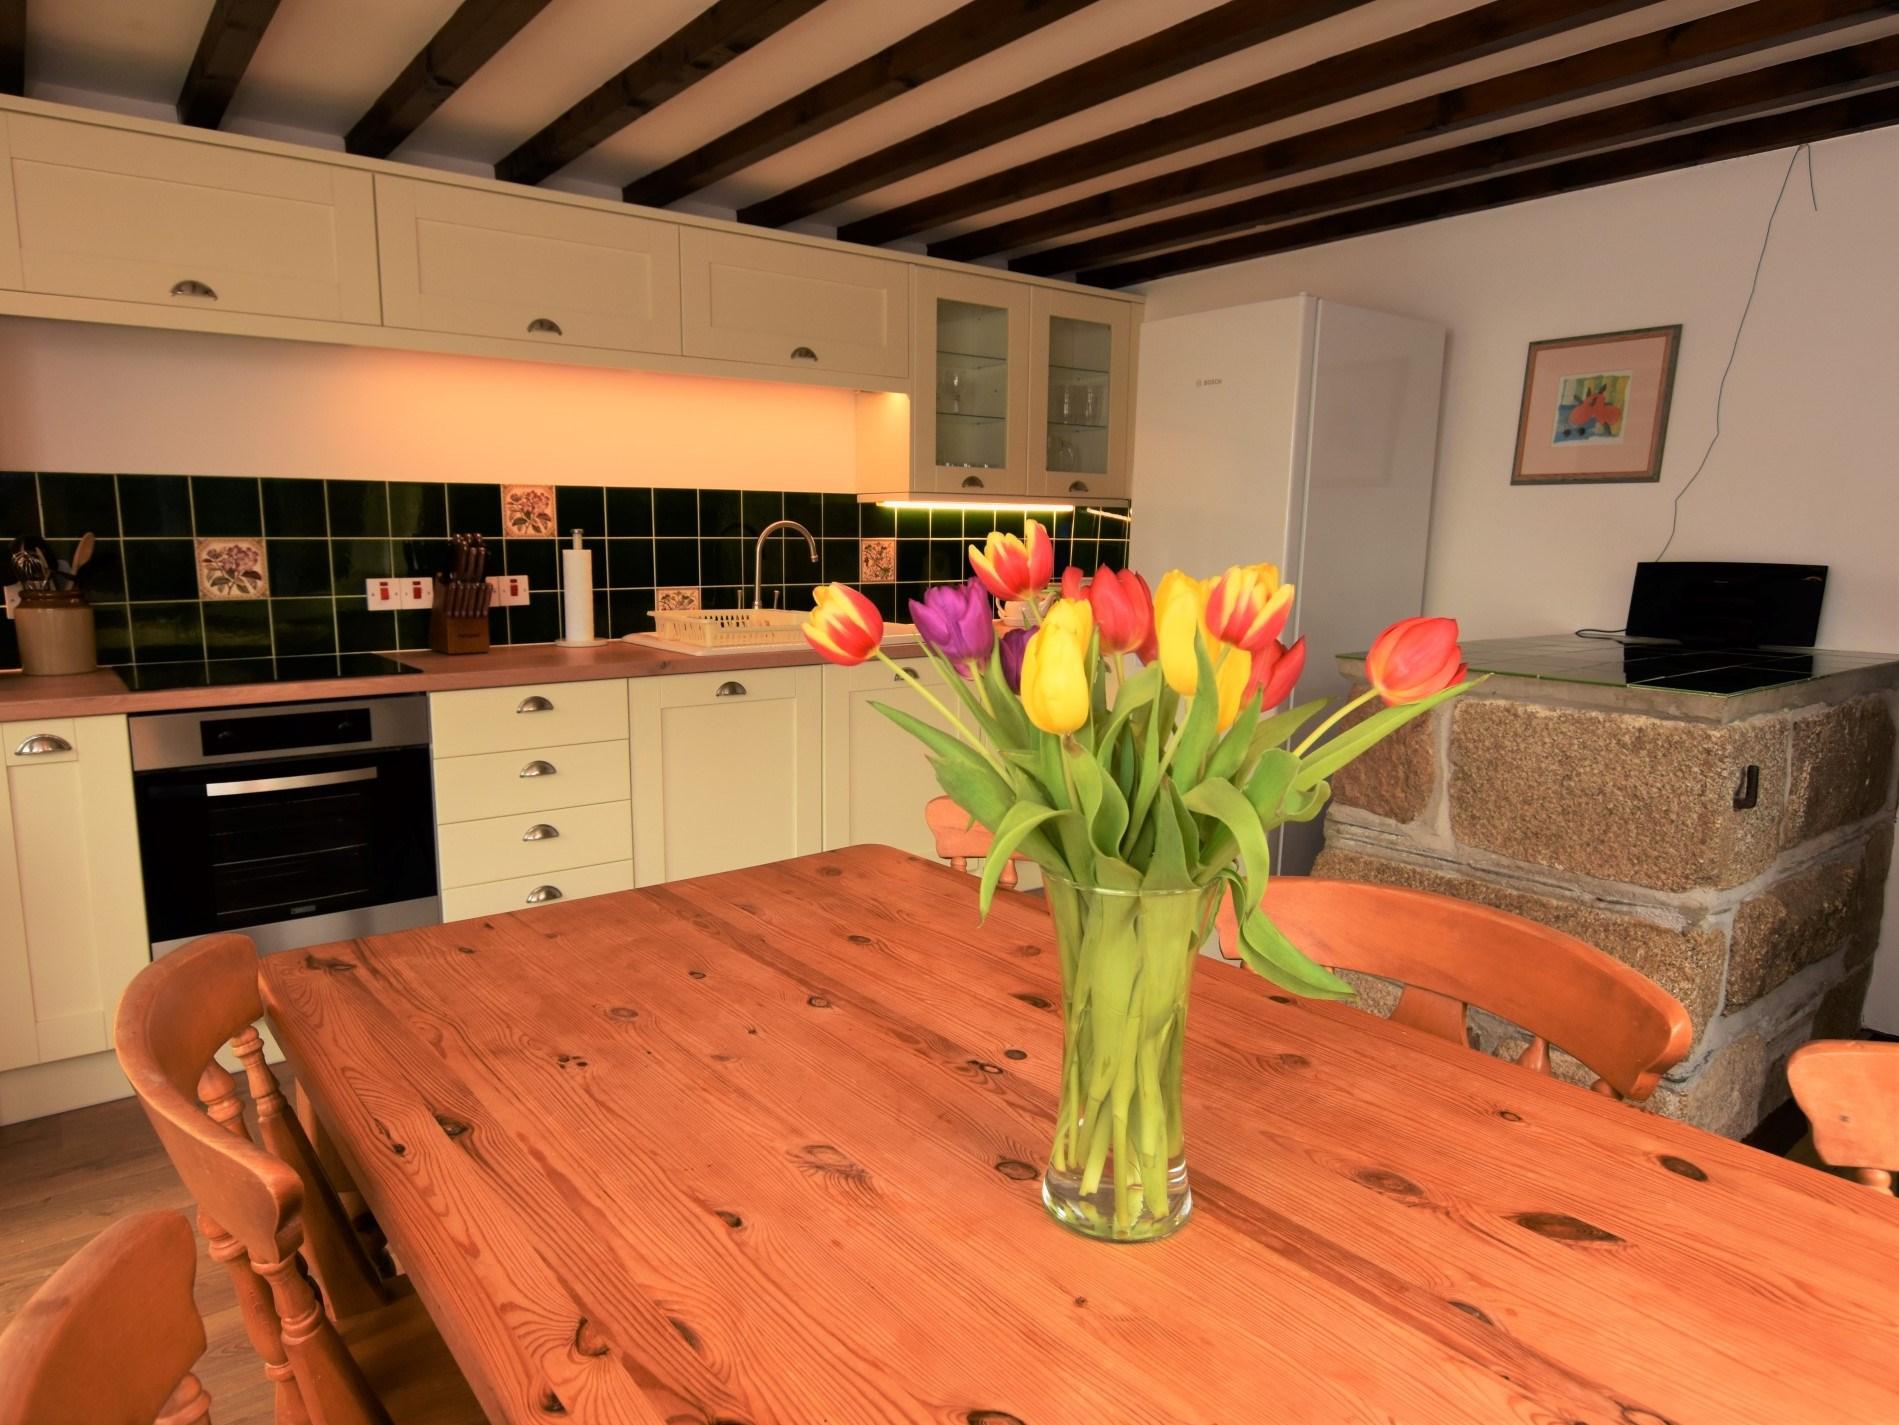 3 Bedroom Cottage in Liskeard, Cornwall